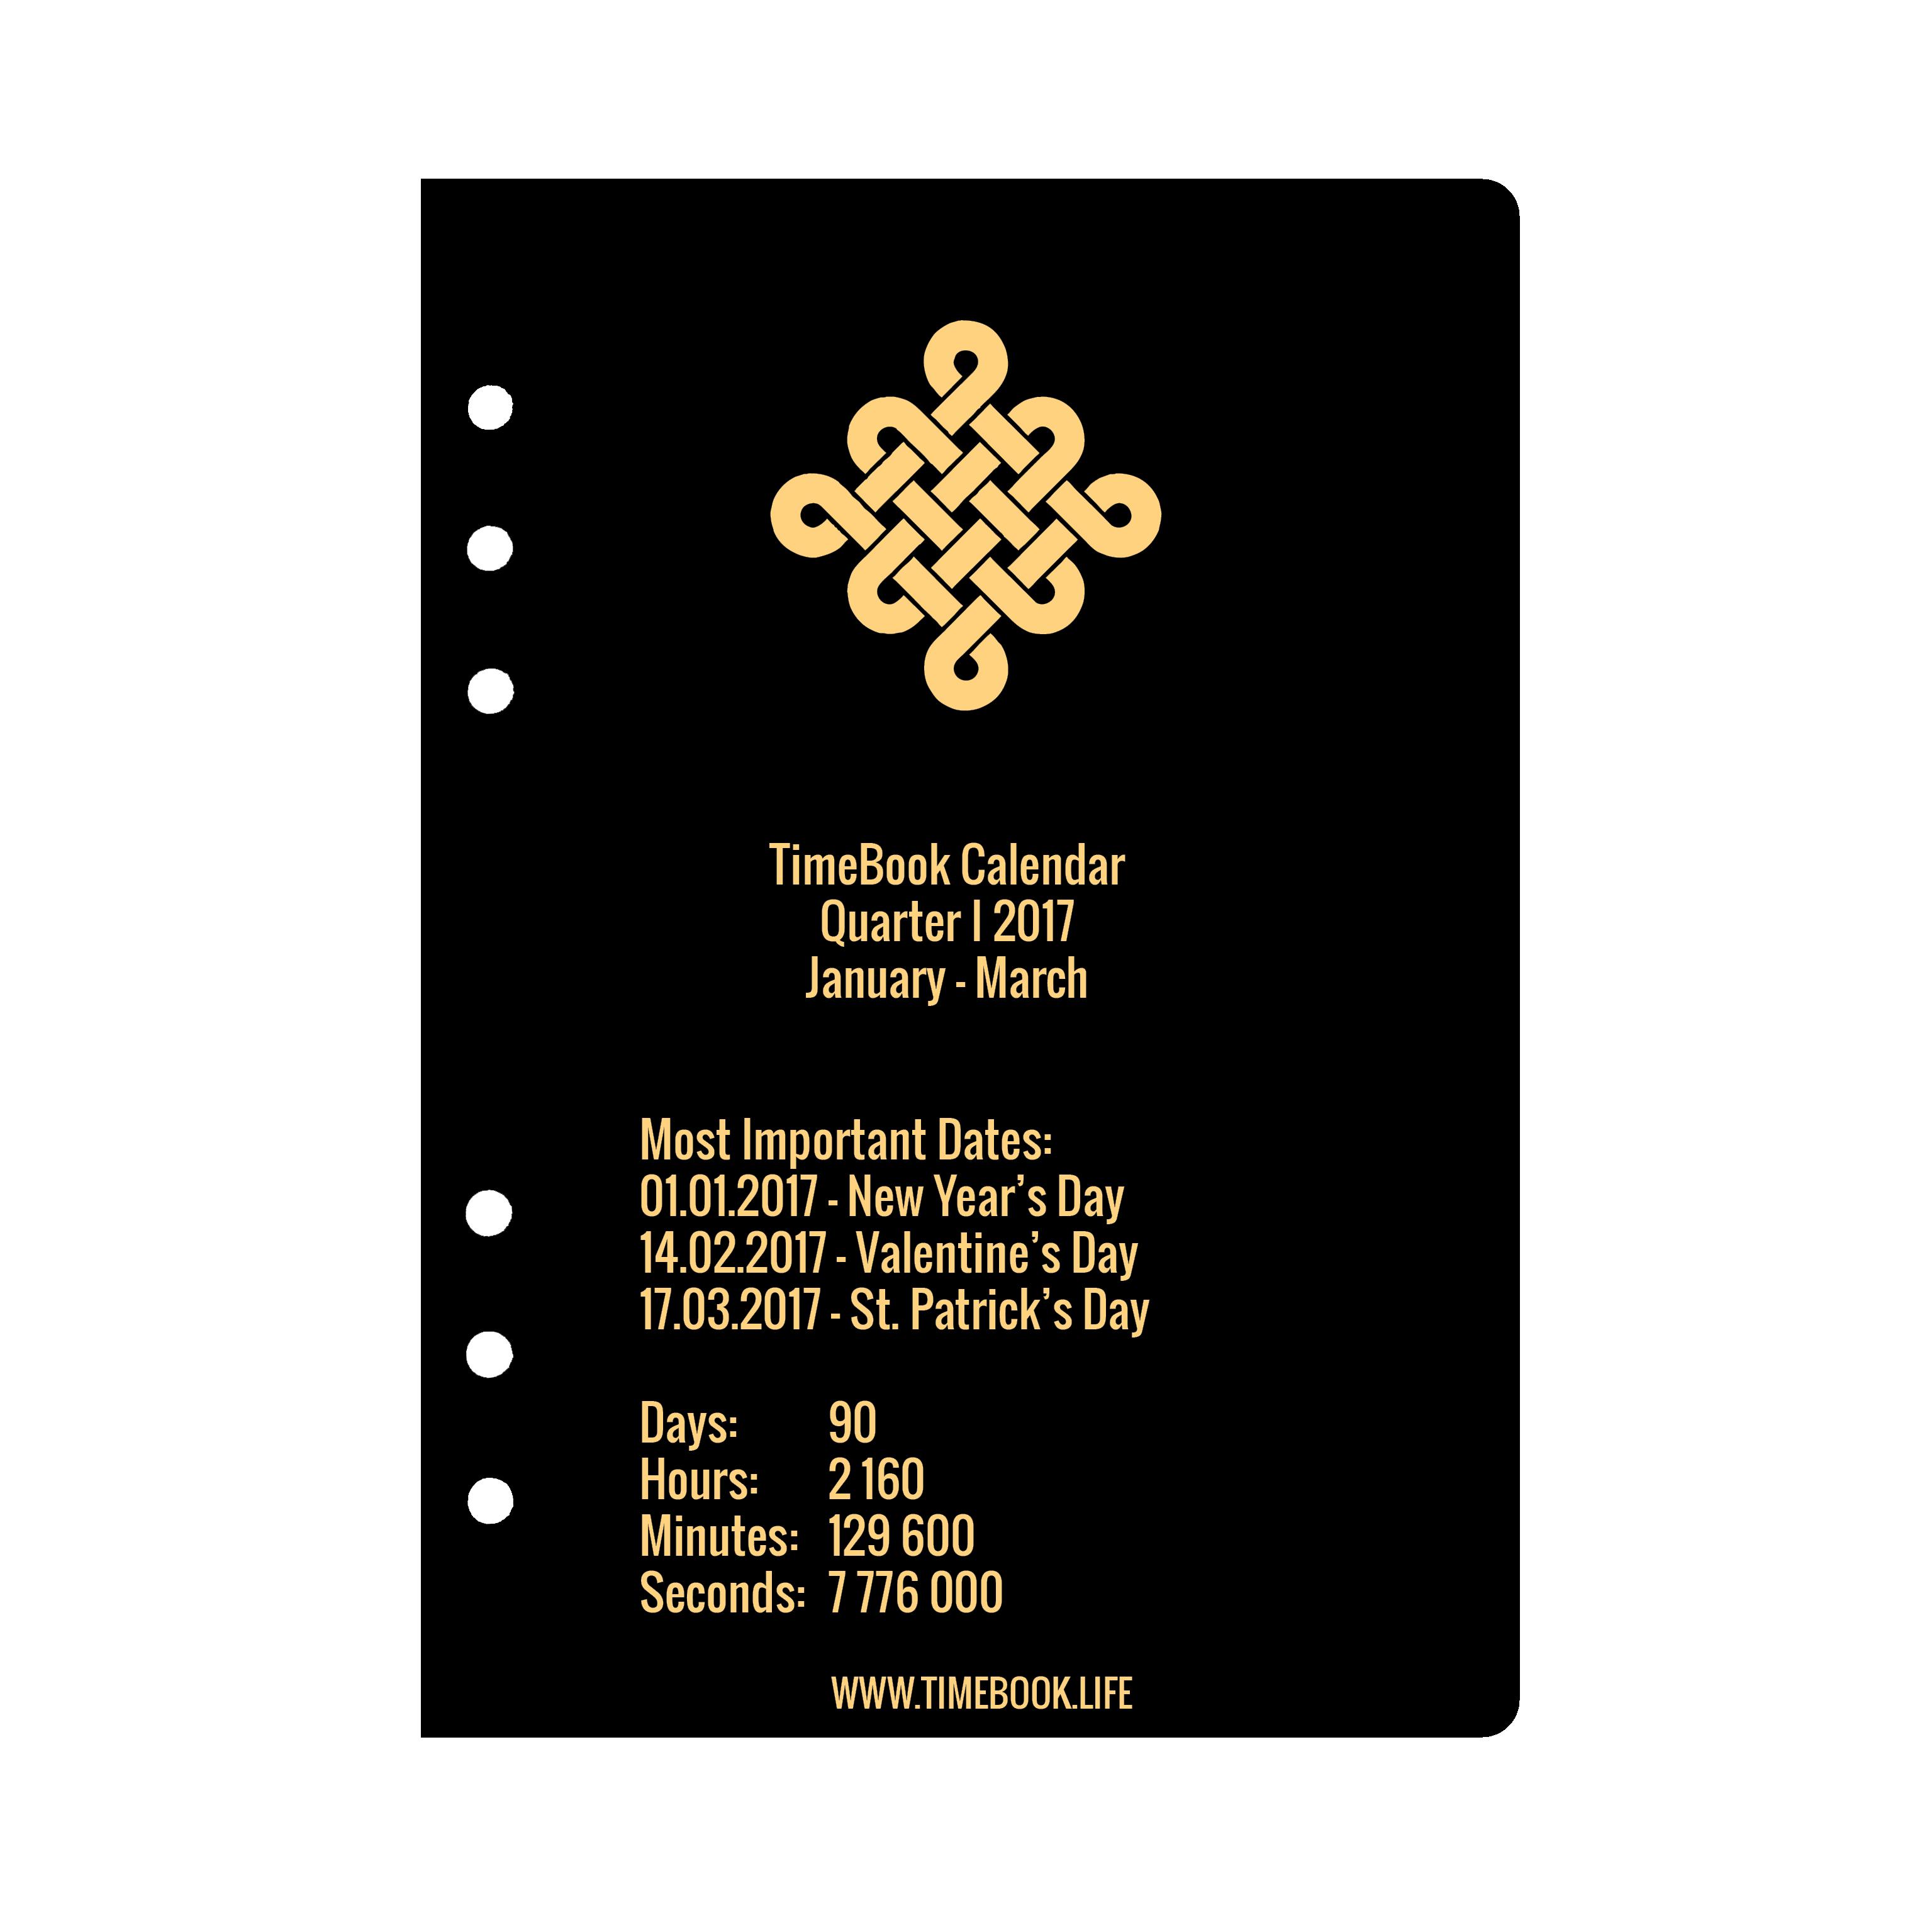 Productivity Calendar 2018 Quarter I (January - March) - TimeBook.life